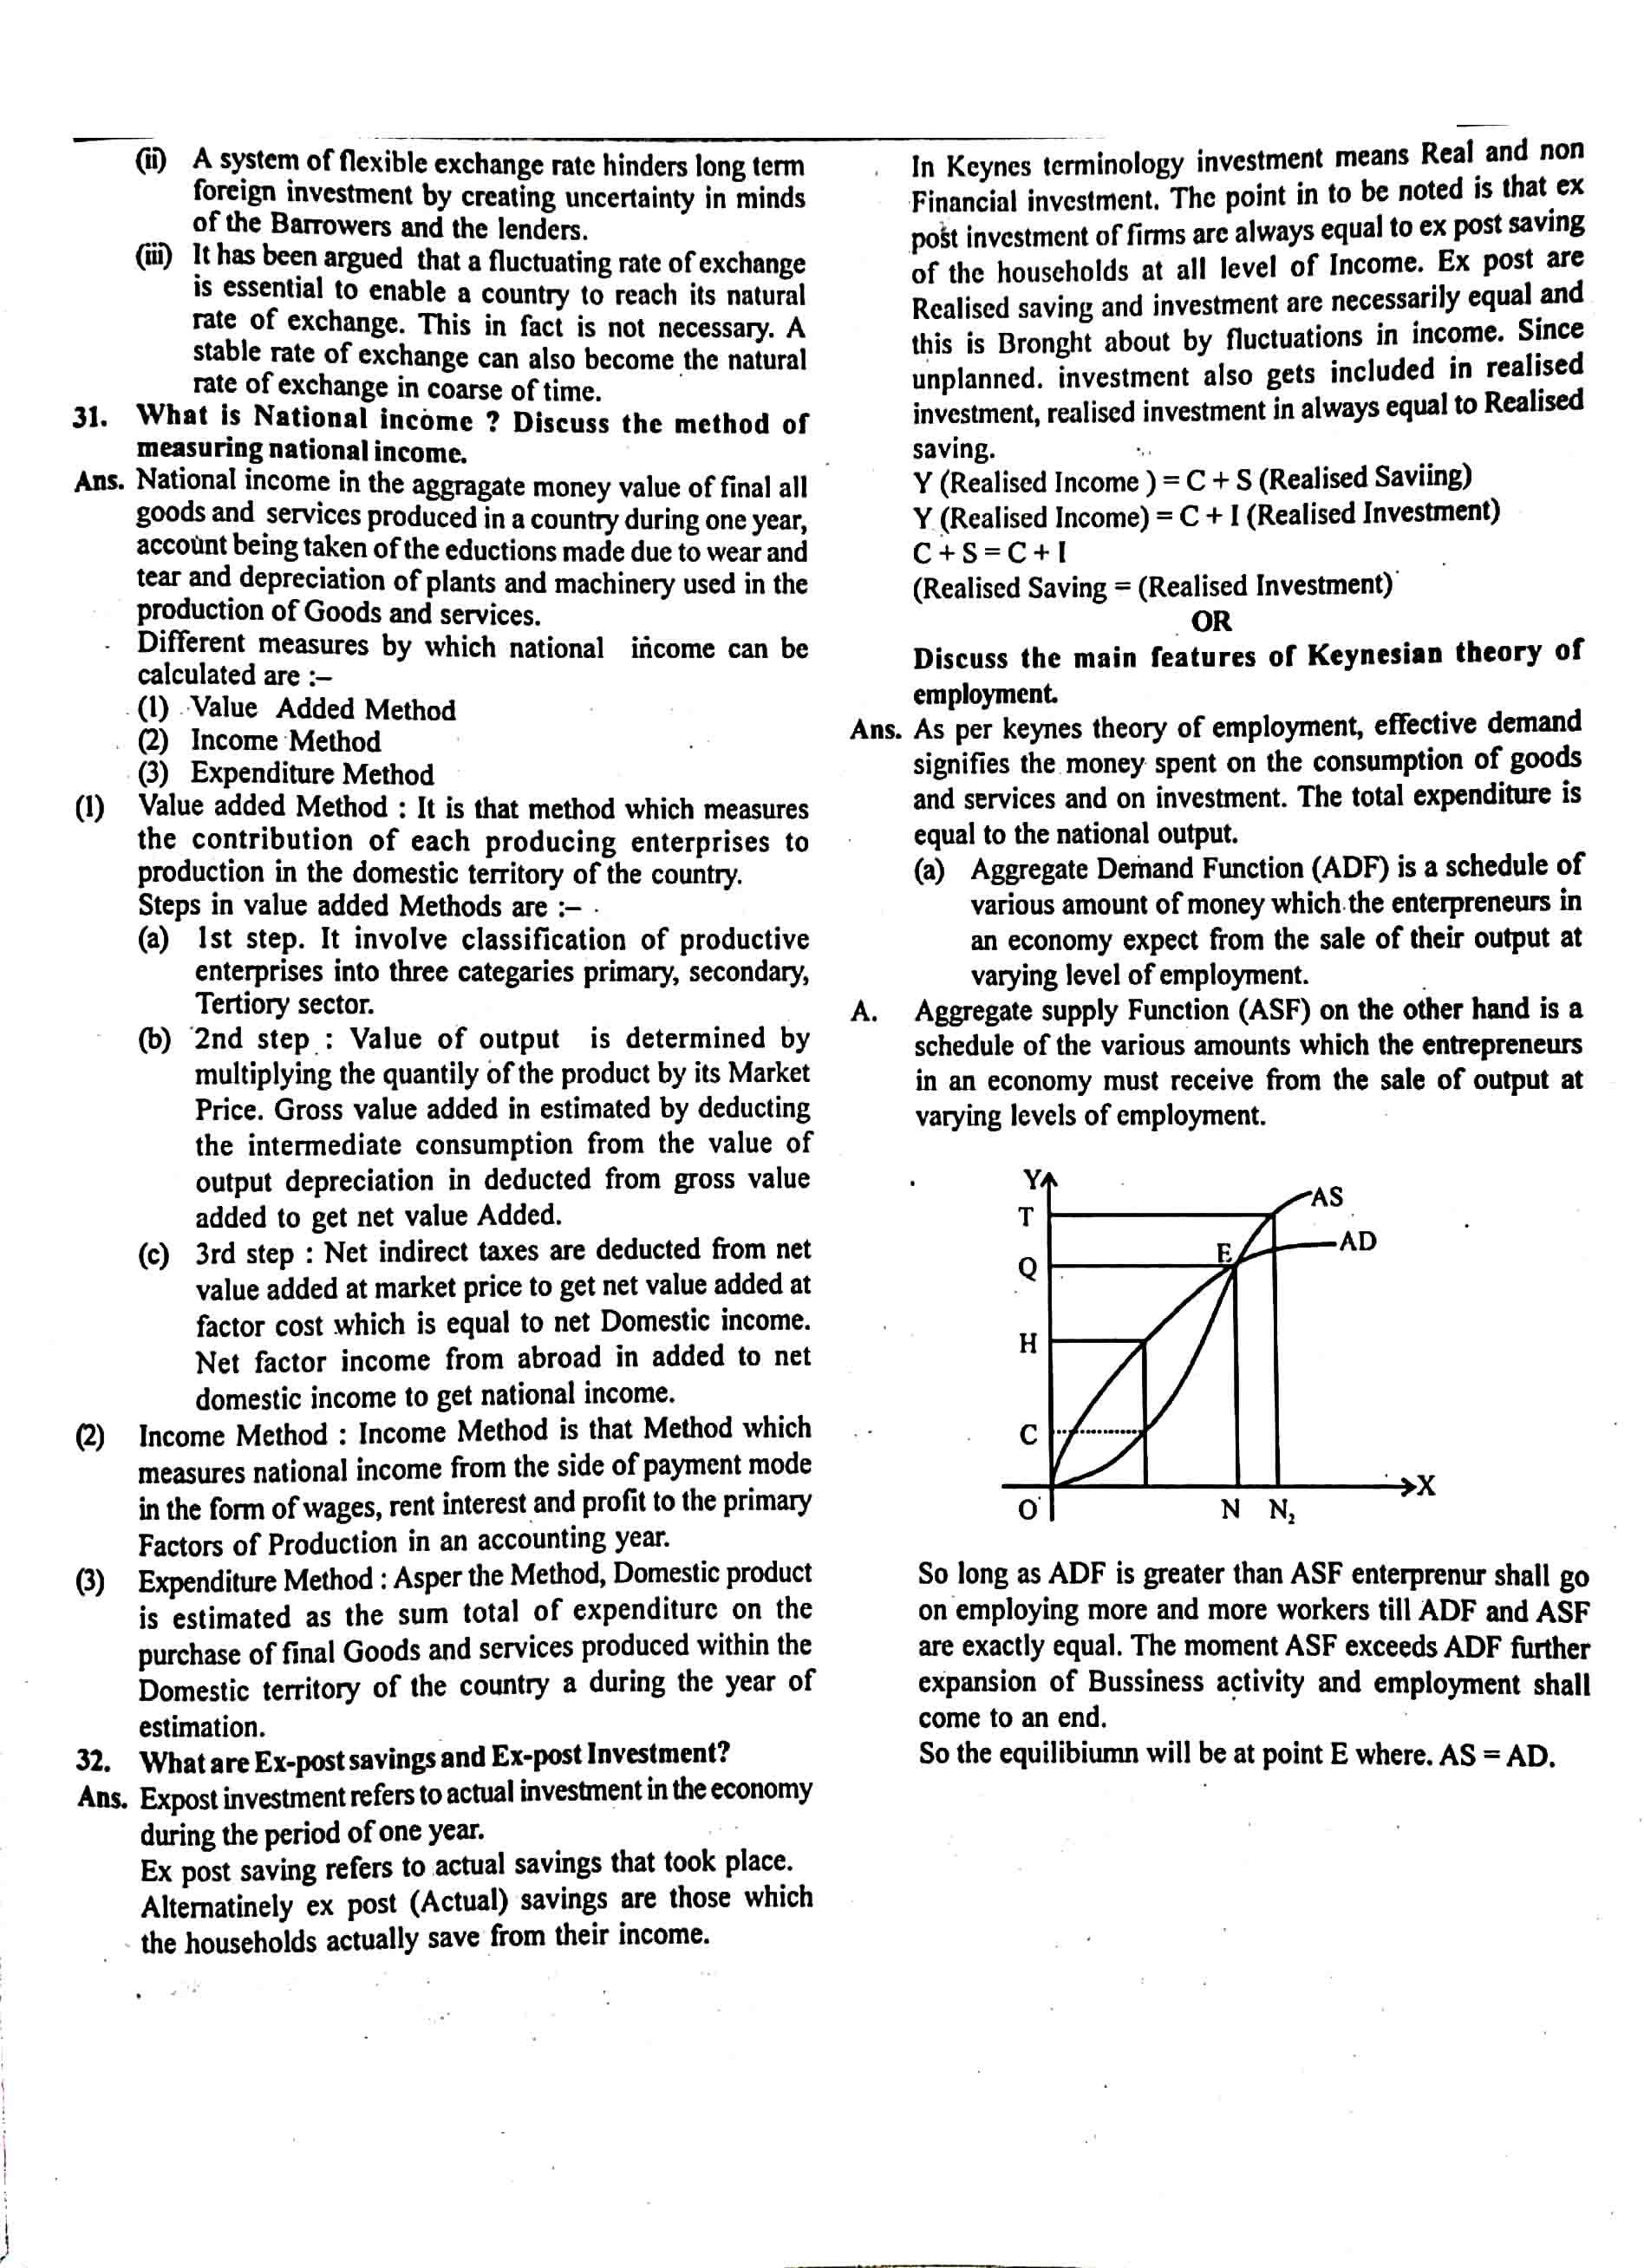 JAC Class 12 economics 2018 Question Paper 05